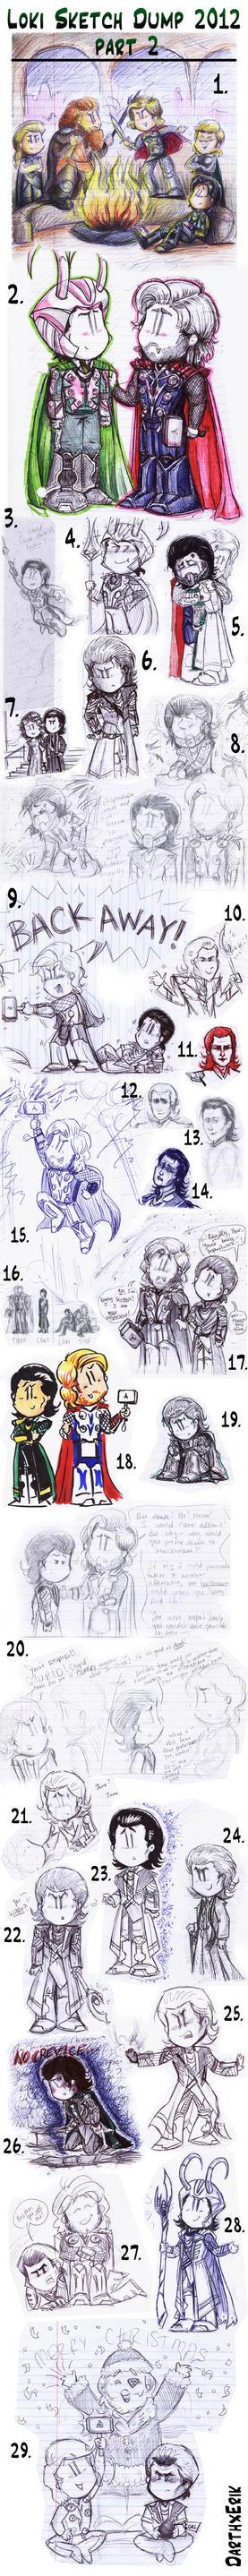 Loki Sketch Dump 2012 part 2 by DarthxErik